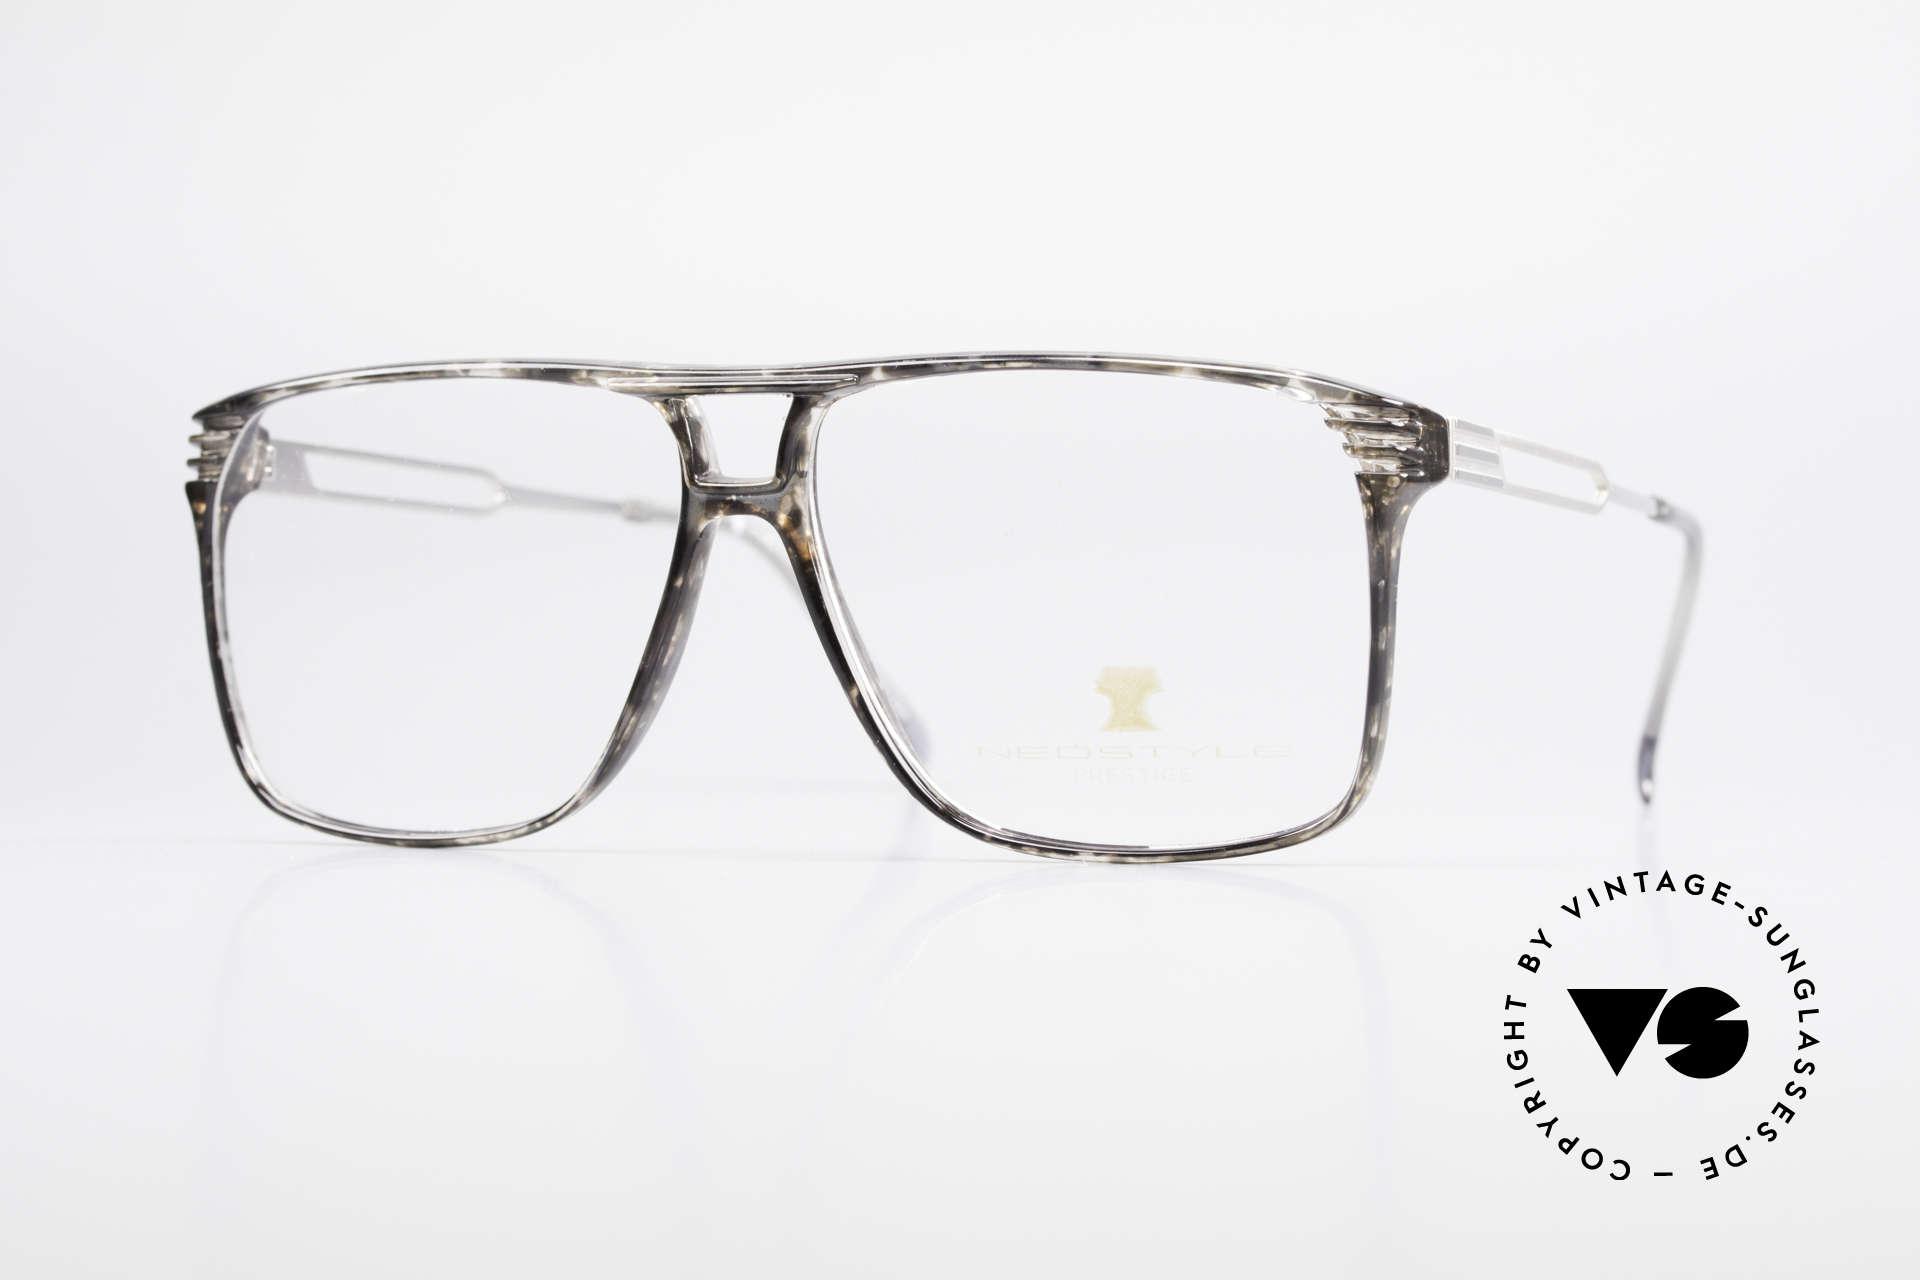 Neostyle Rotary Prestige 33 Titan Frame 80's Eyeglasses, Neostyle Rotary Prestige Titan vintage eyeglasses, Made for Men